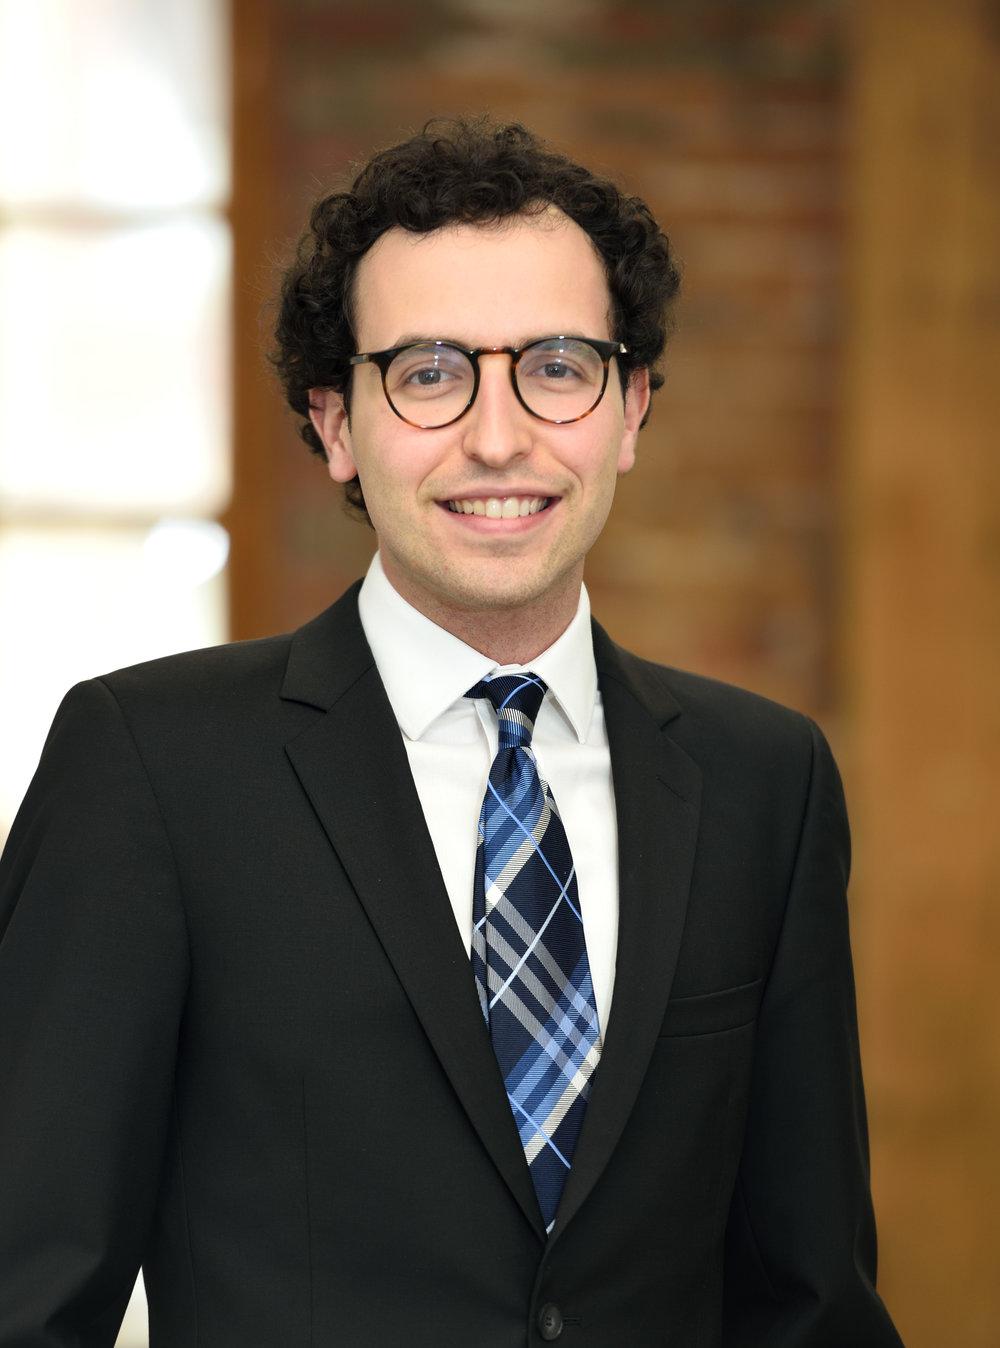 Grant Goldberg